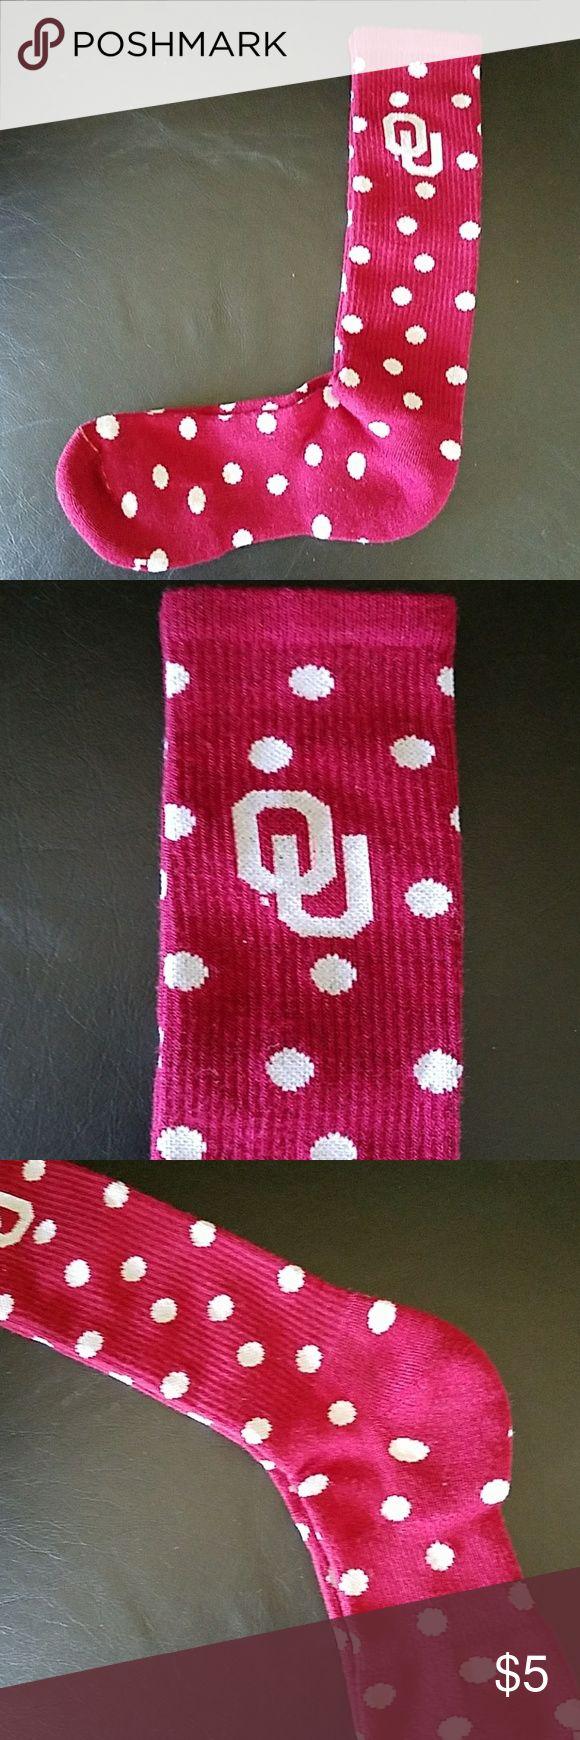 New OU sooner socks Perfect for OU football games Accessories Hosiery & Socks